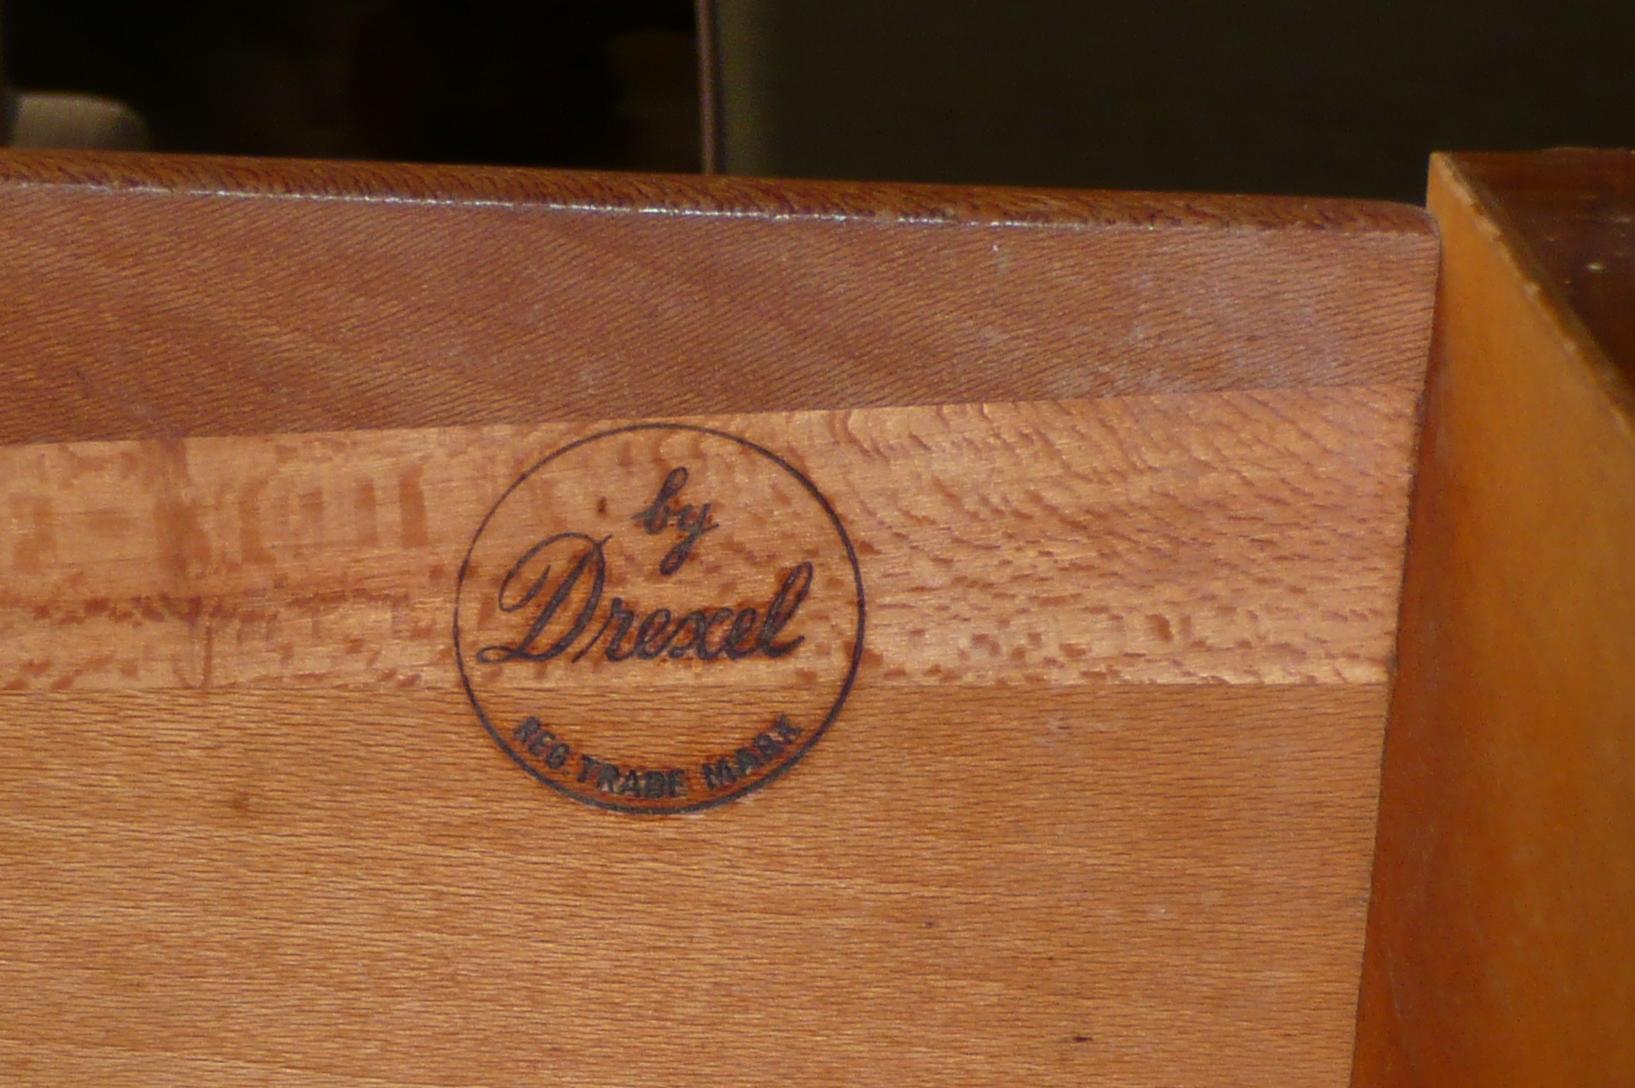 Drexel Quot Precedent Quot Bedroom Furniture Antique Appraisal